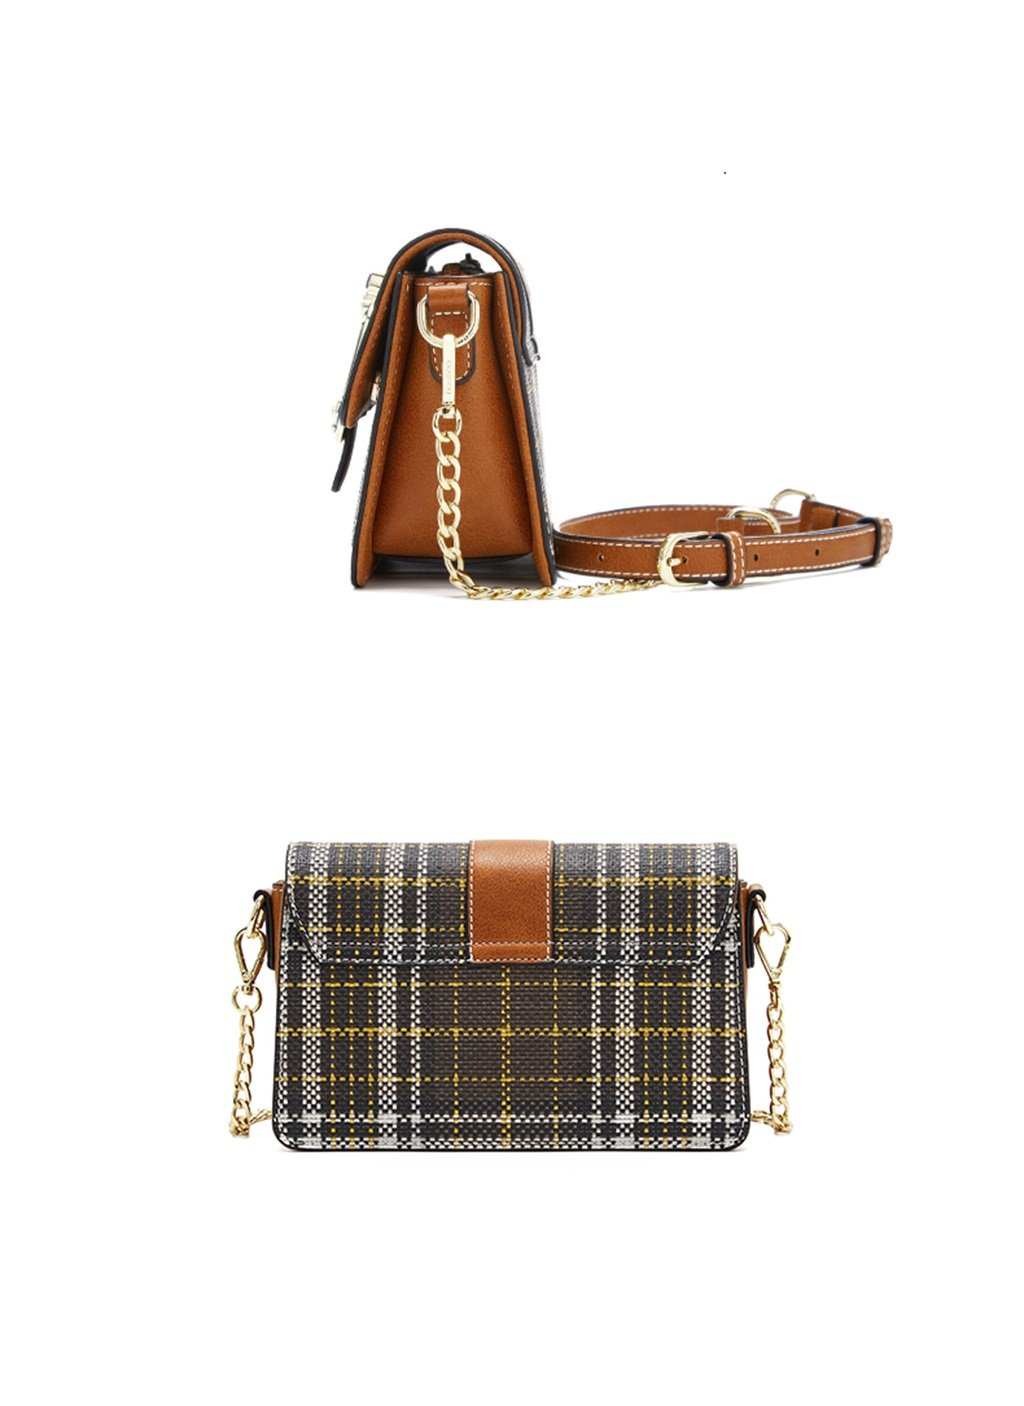 Bolso de Mujer Pequeño Bolso de Hombro de Cadena de Oro Mini Bolso de Noche Clásico de Embrague de Cruz (Color : #2): Amazon.es: Hogar